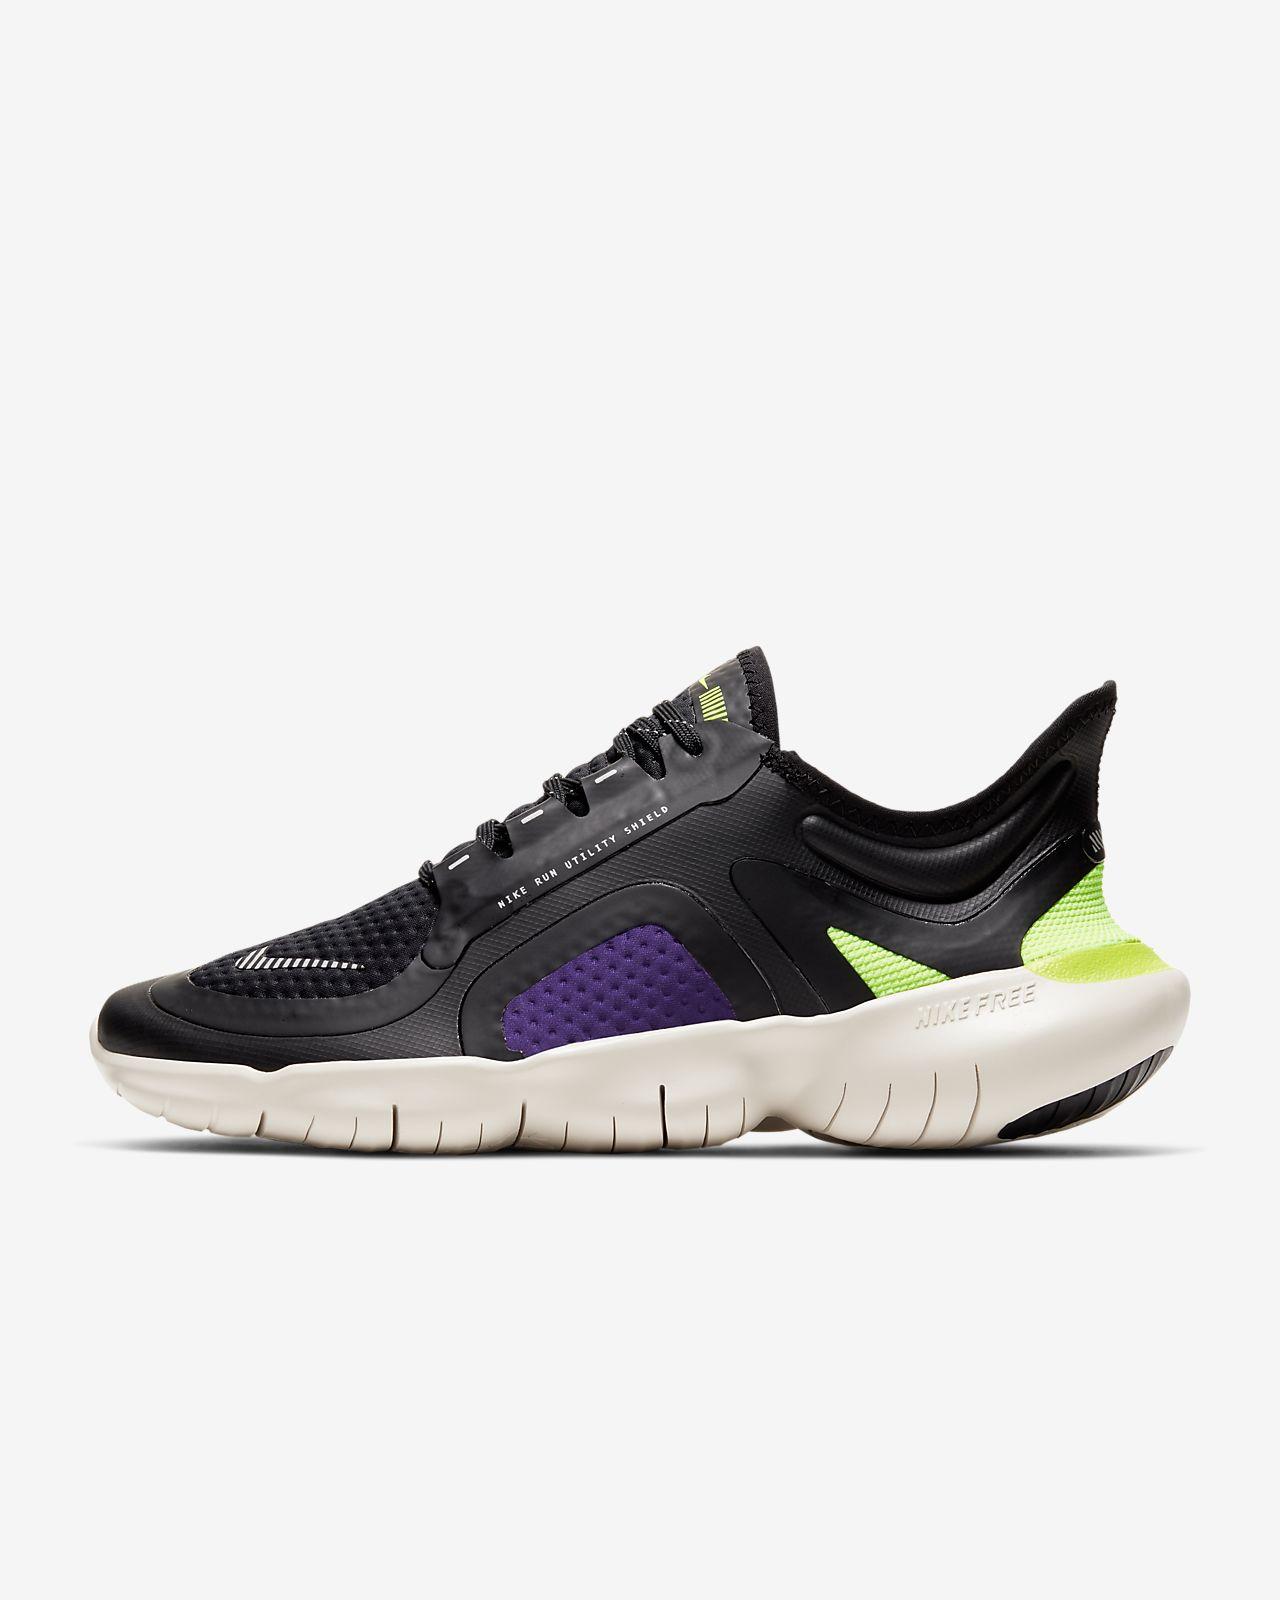 Женские беговые кроссовки Nike Free RN 5.0 Shield